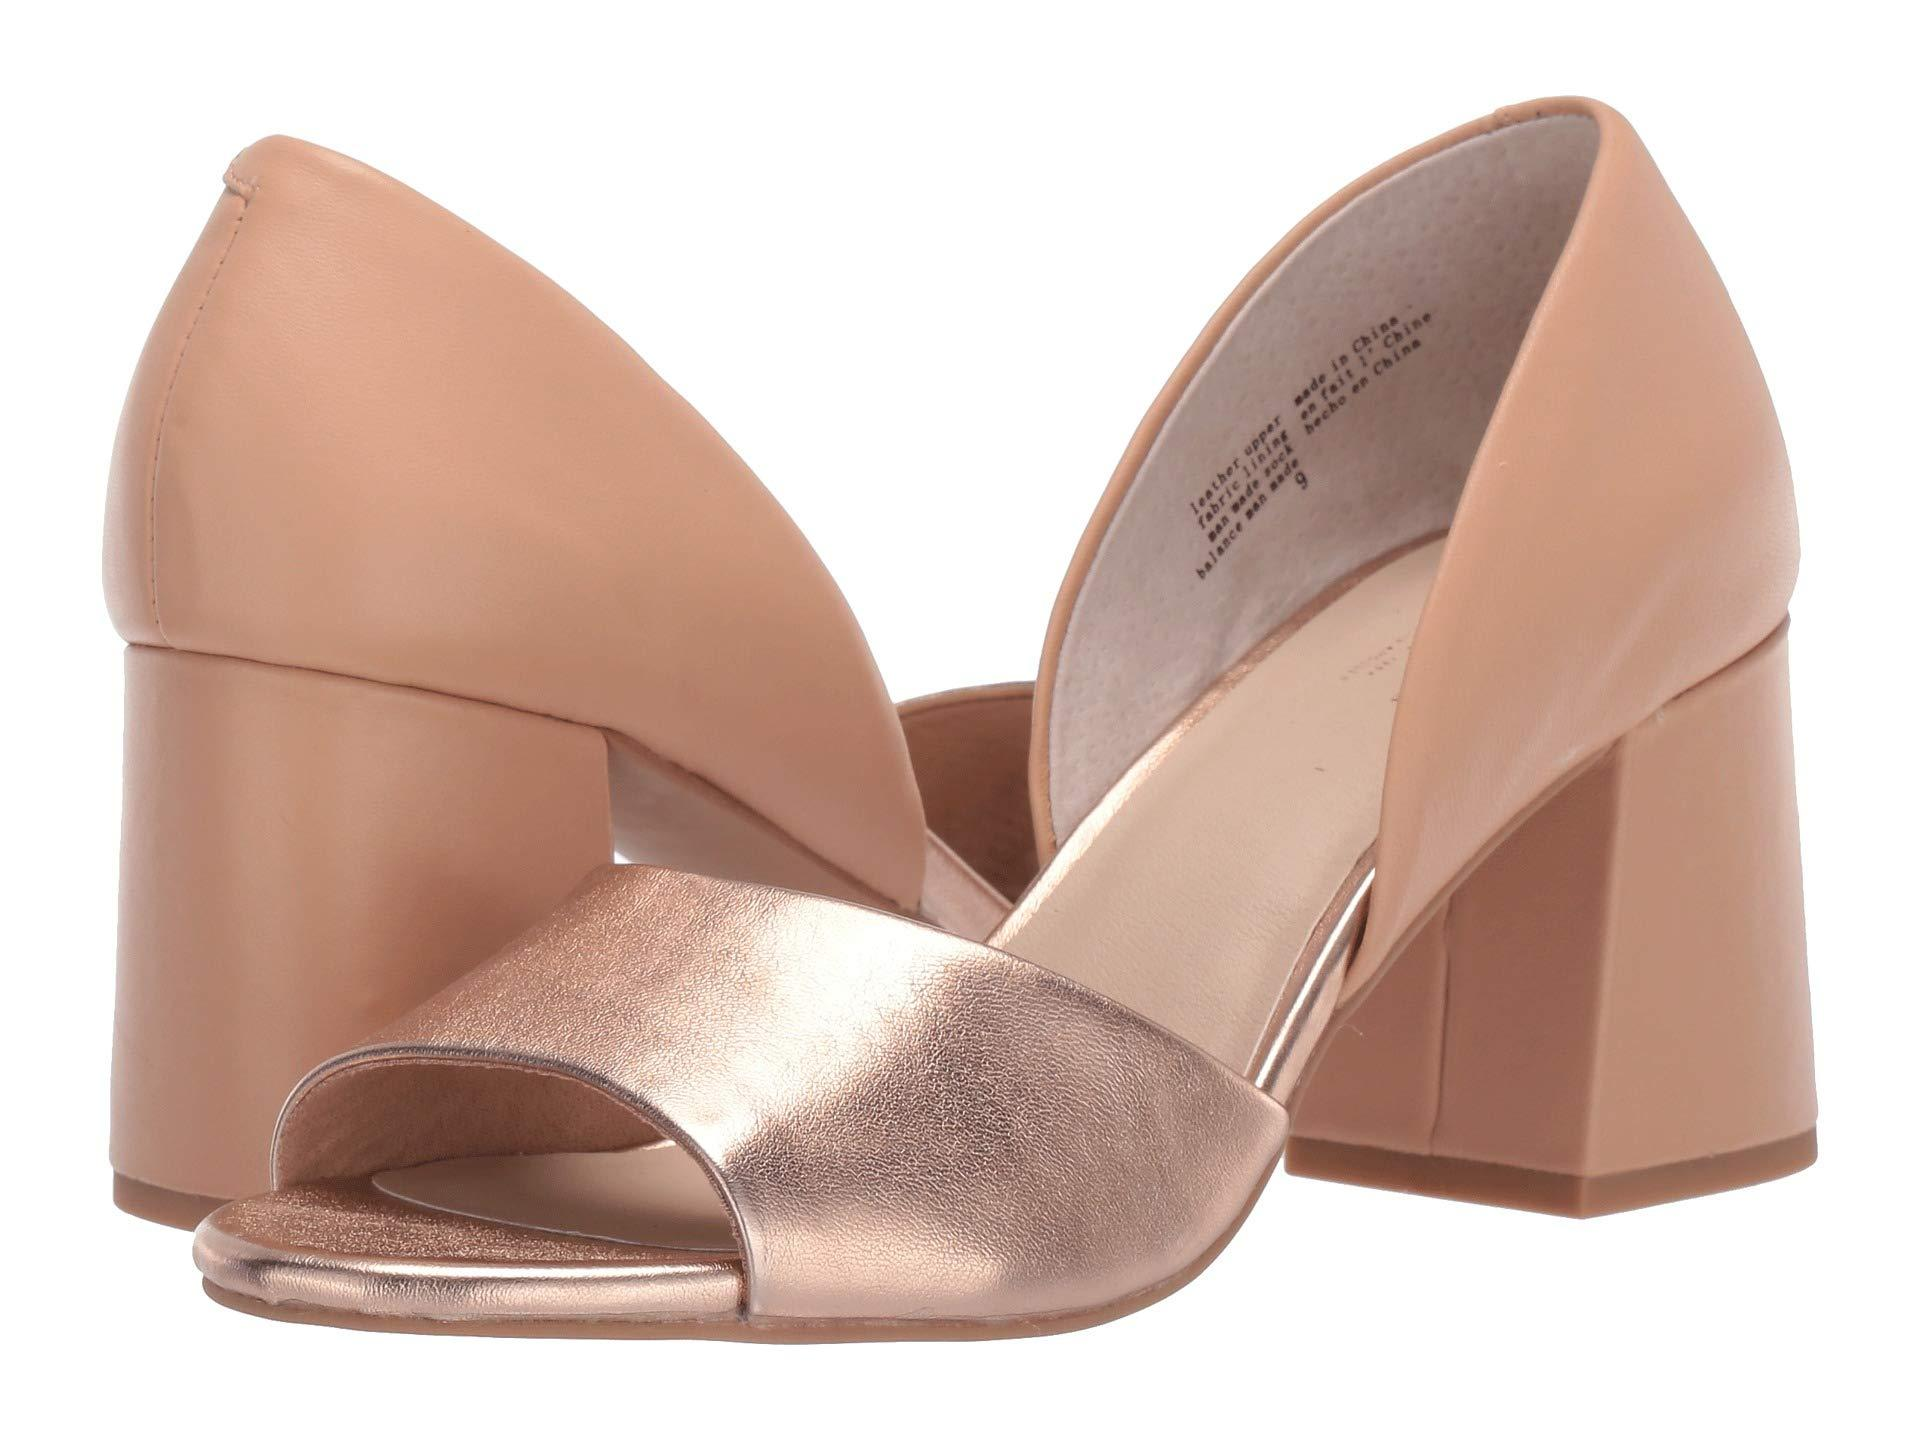 5c542af7b5b Lyst - Seychelles Shabby Chic (rose Gold/nude Leather) High Heels